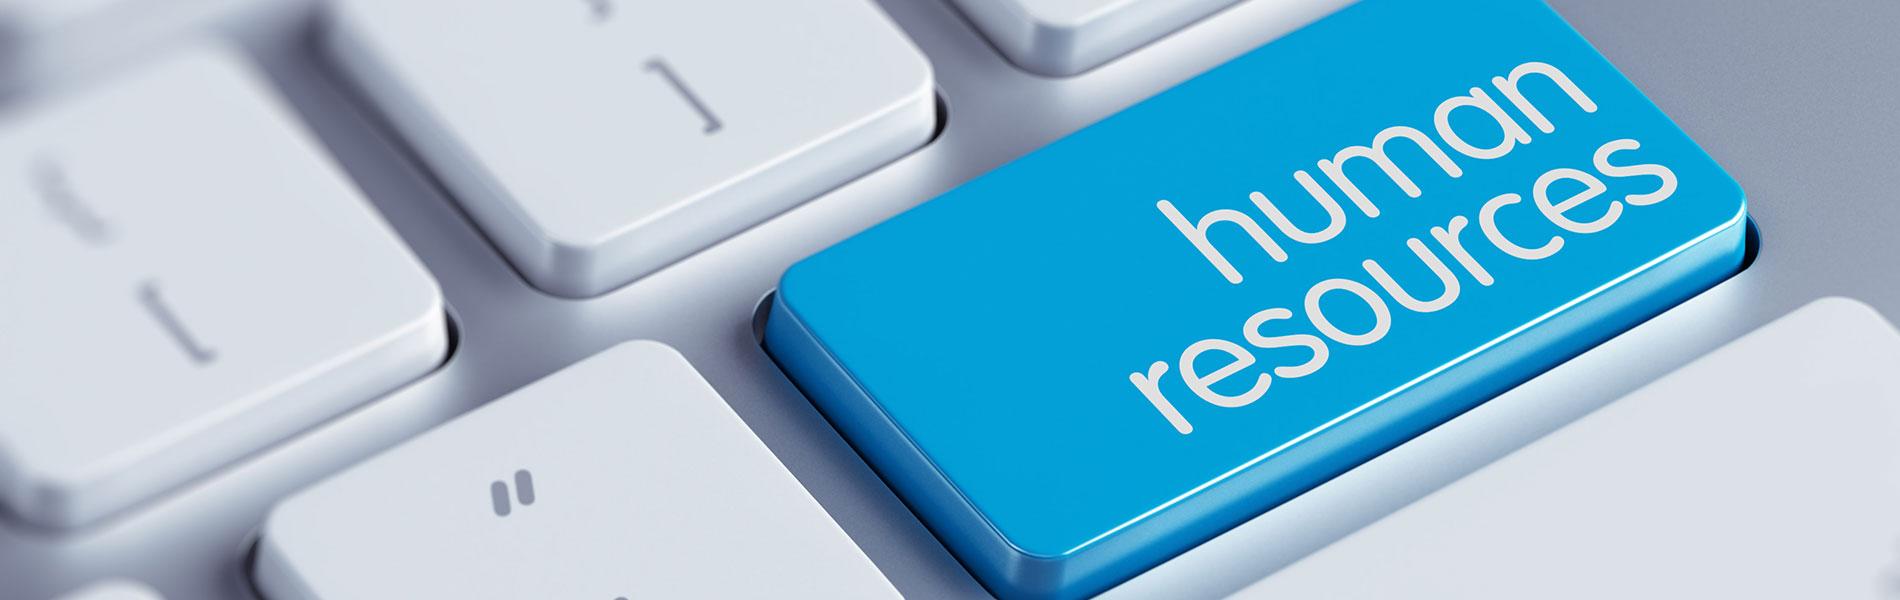 hr hinds human resources keyboard region 7